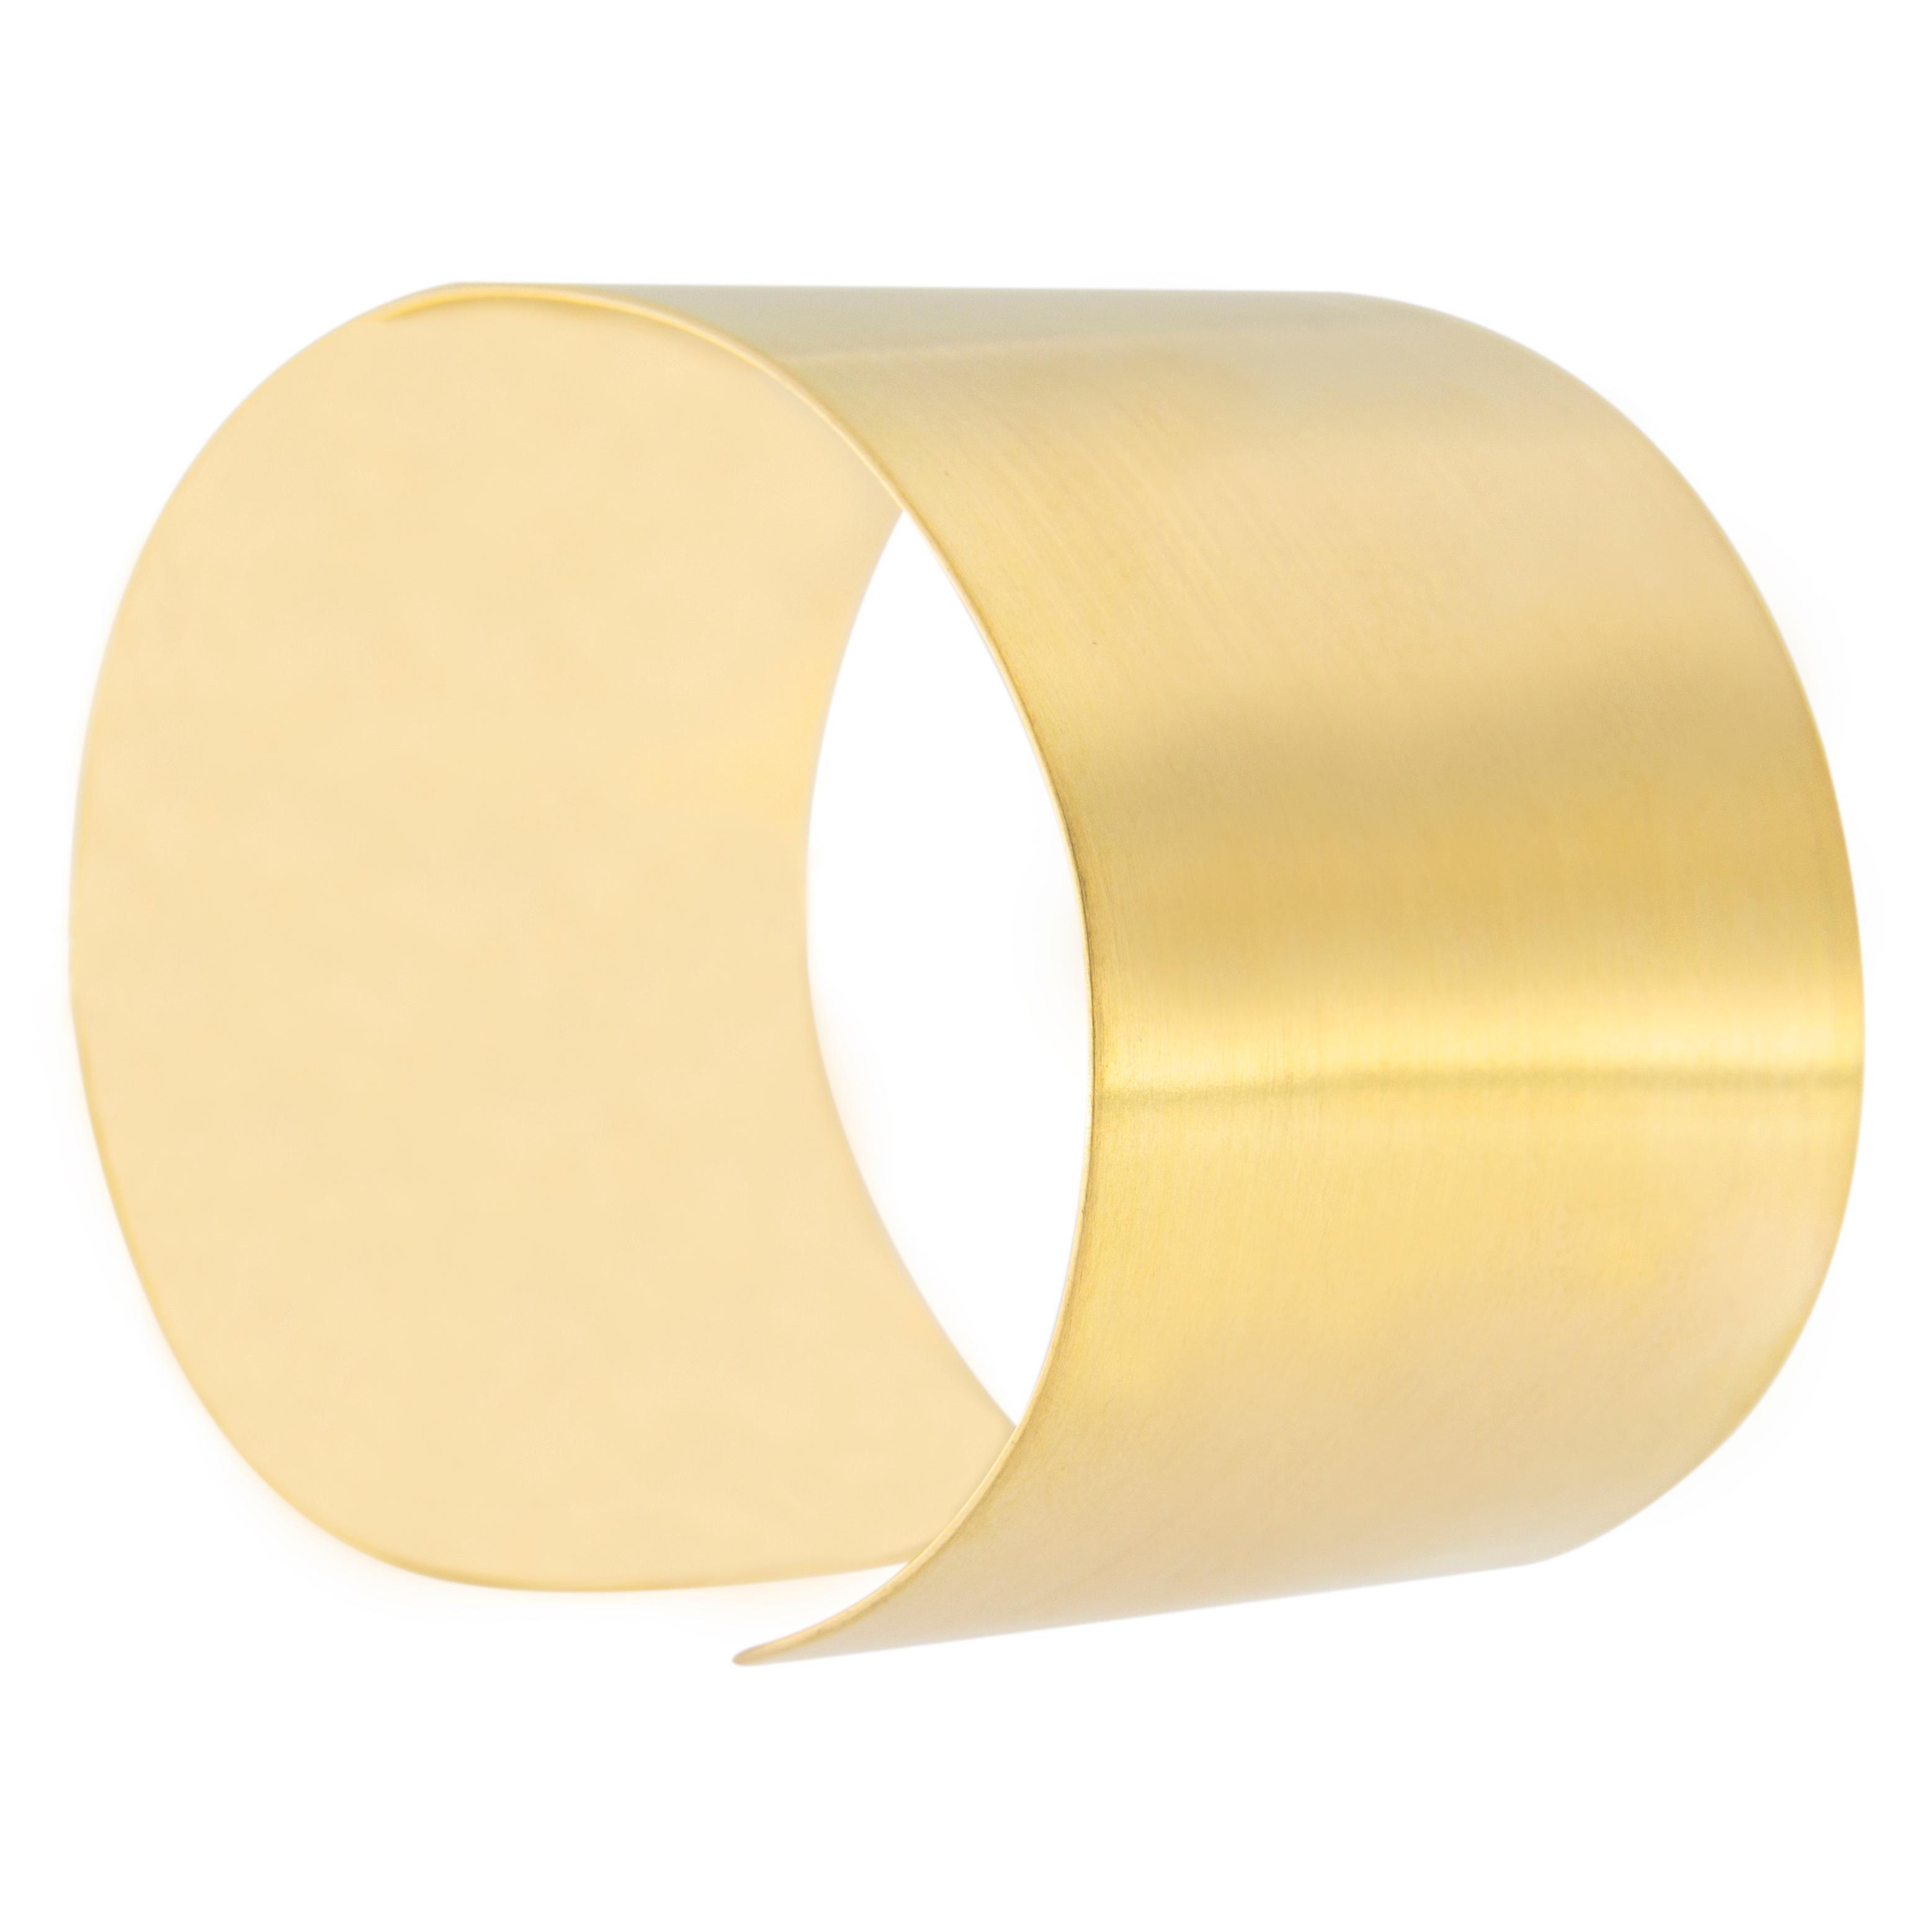 Alex Jona 18 Karat Satin Yellow Gold Cuff Bracelet